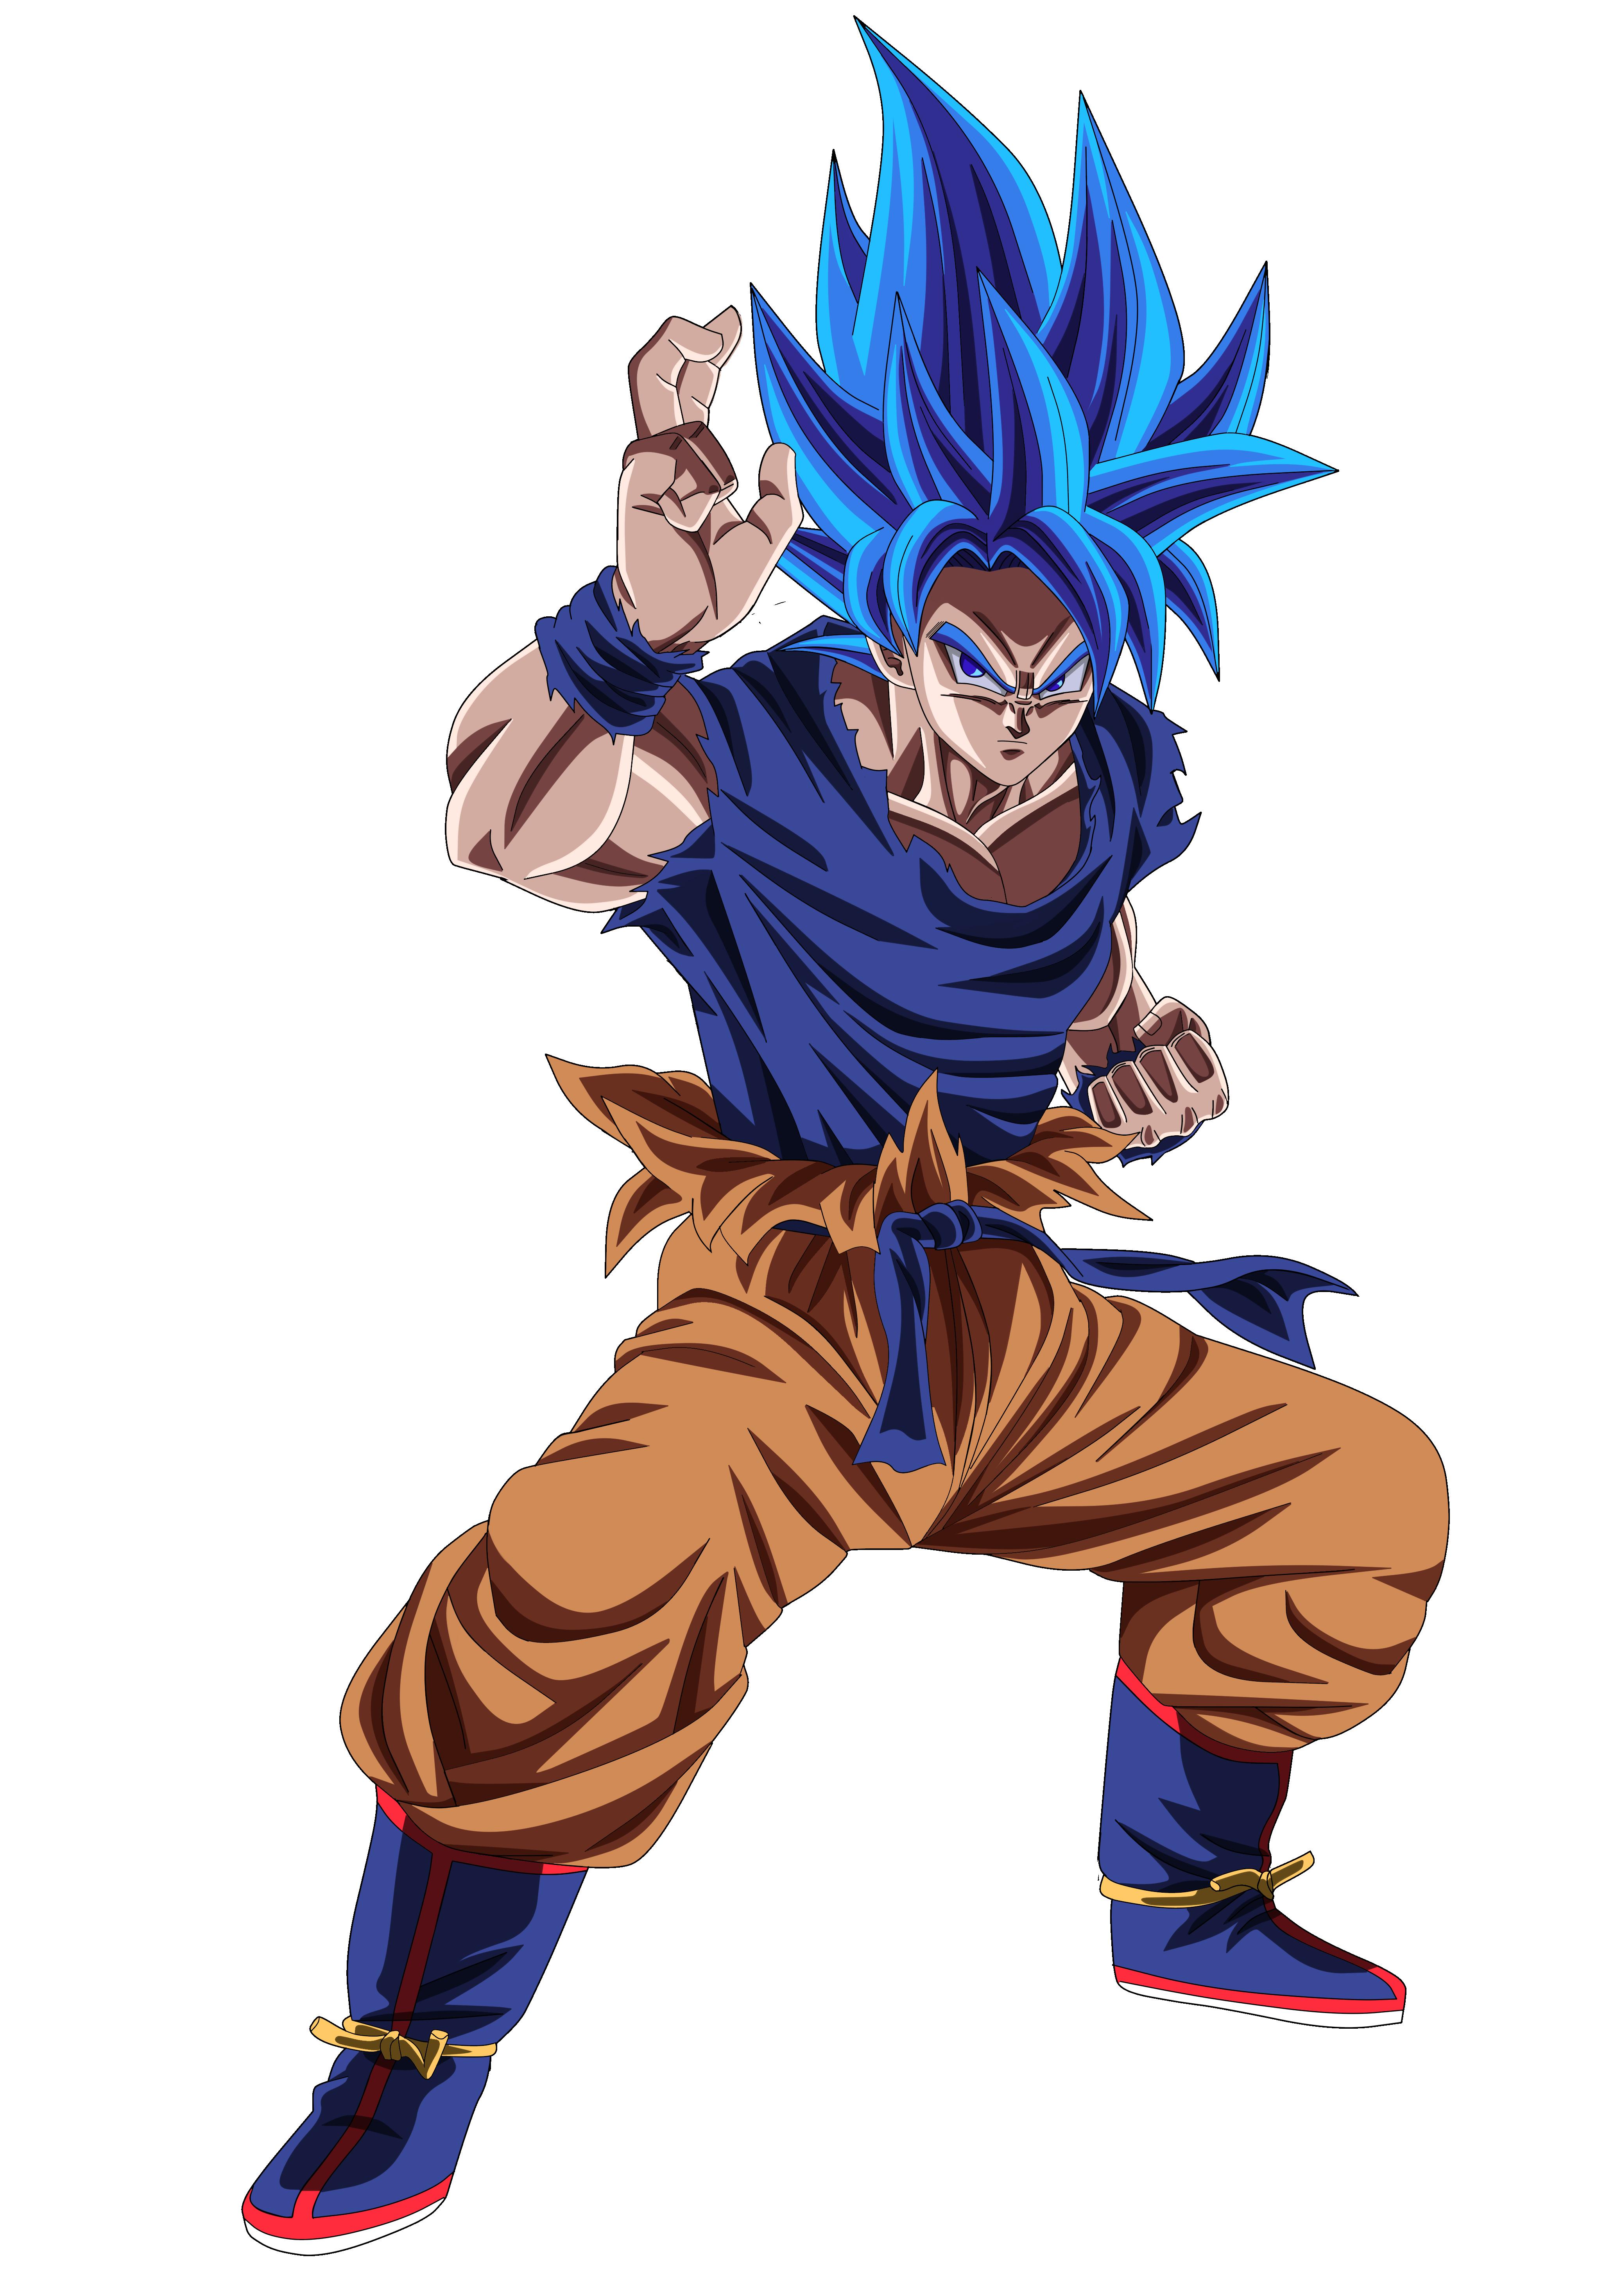 Goku By Dt501061 On Deviantart Anime Dragon Ball Super Dragon Ball Super Goku Dragon Ball Super Art